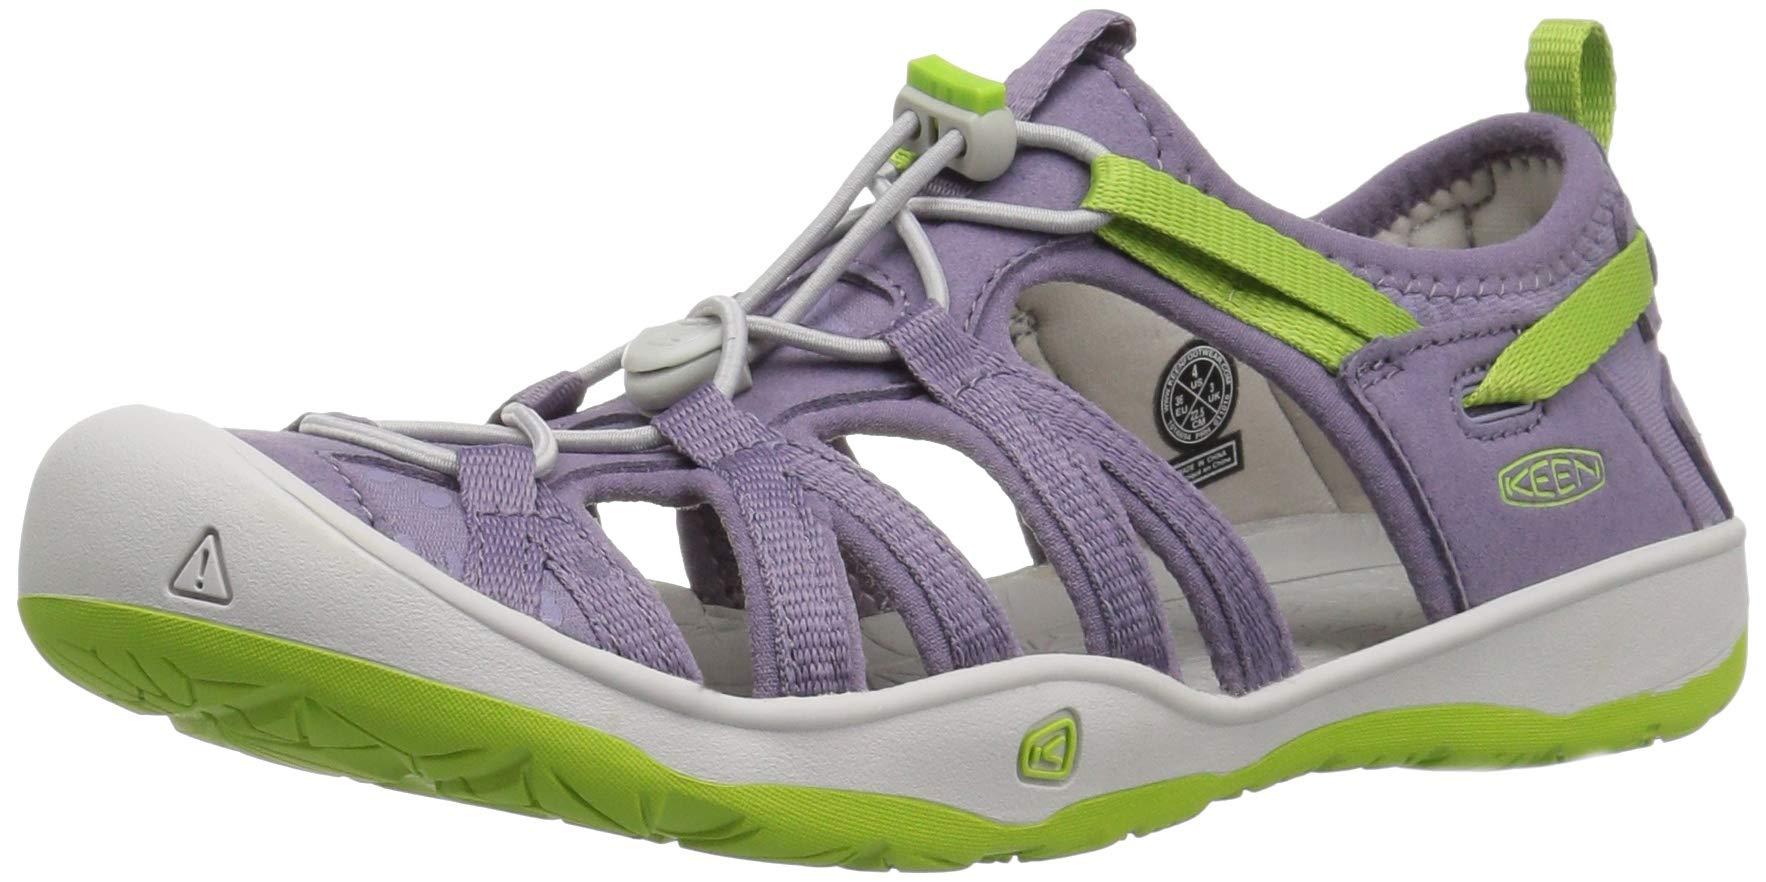 KEEN Unisex Moxie Sandal, Purple SAGE/Greenery, 6 M US Big Kid by KEEN (Image #1)